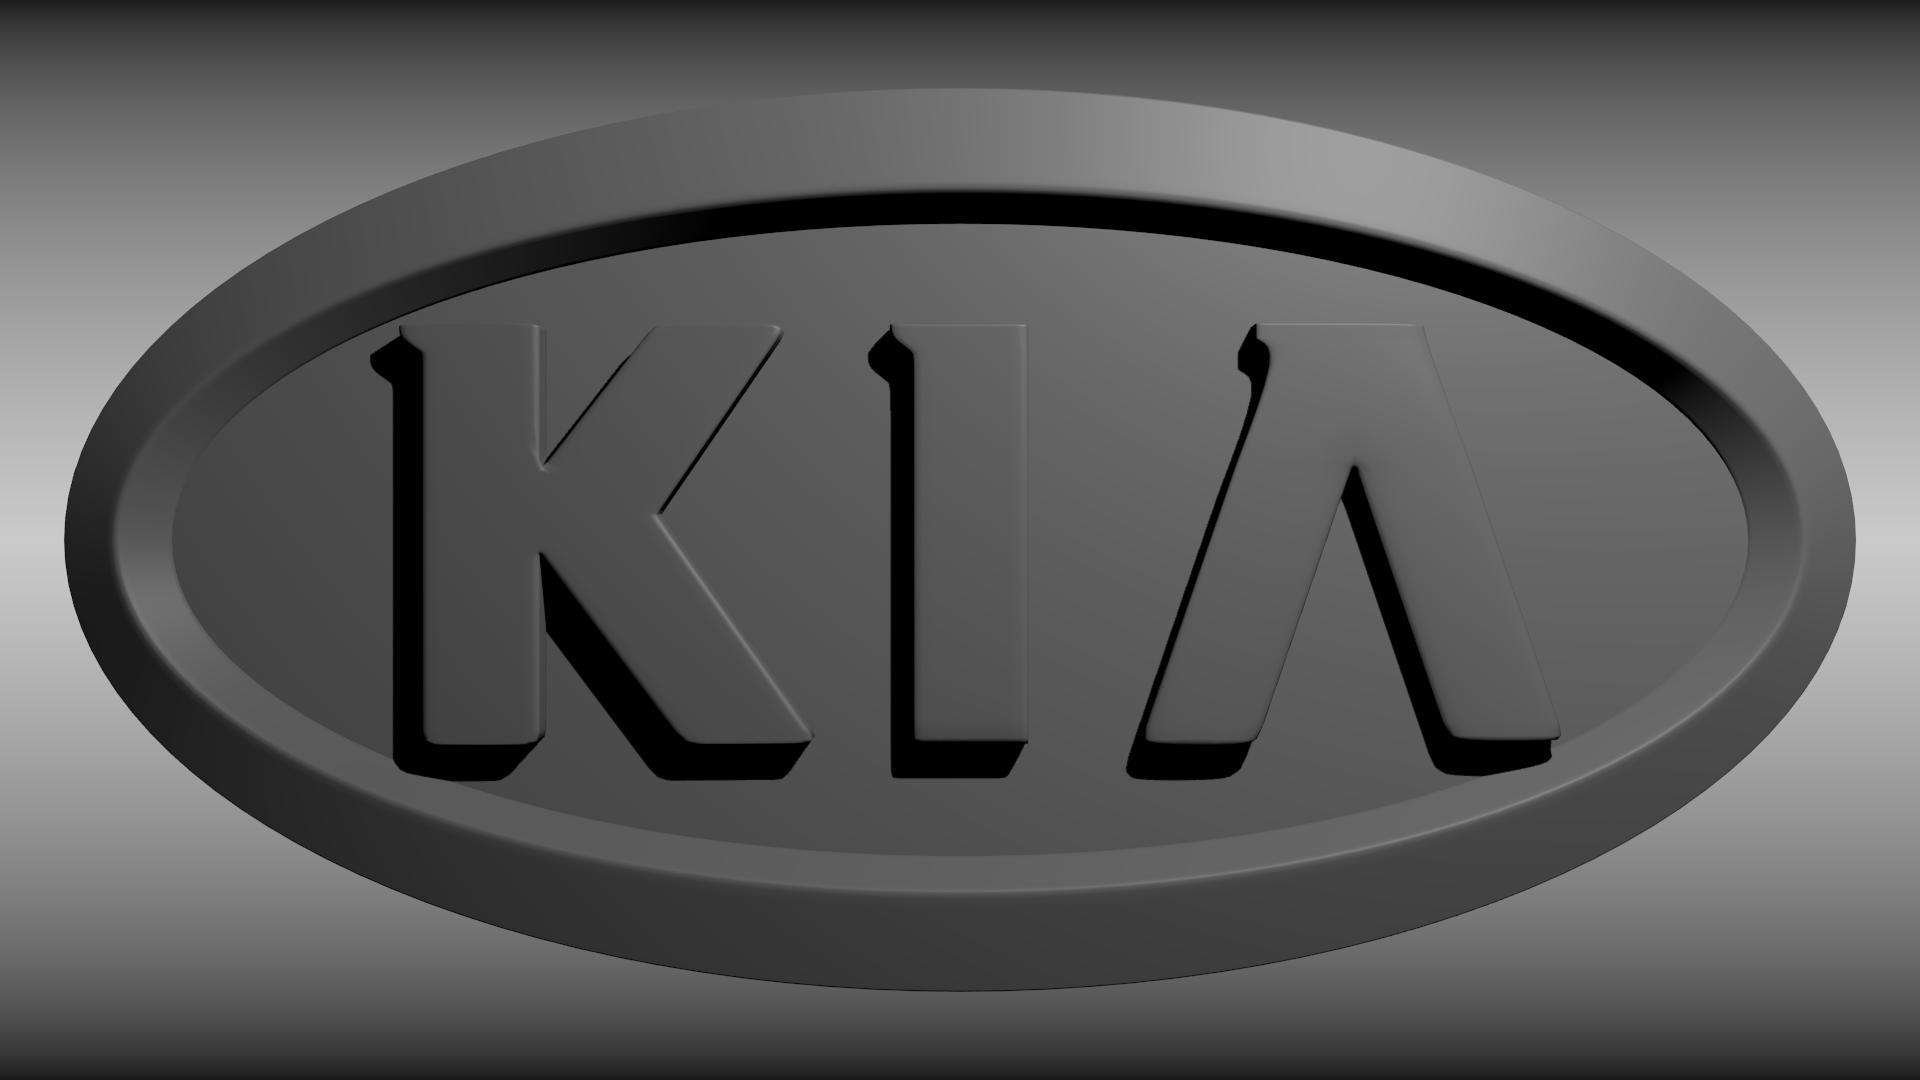 KIA Logo 3D Model Obj Blend